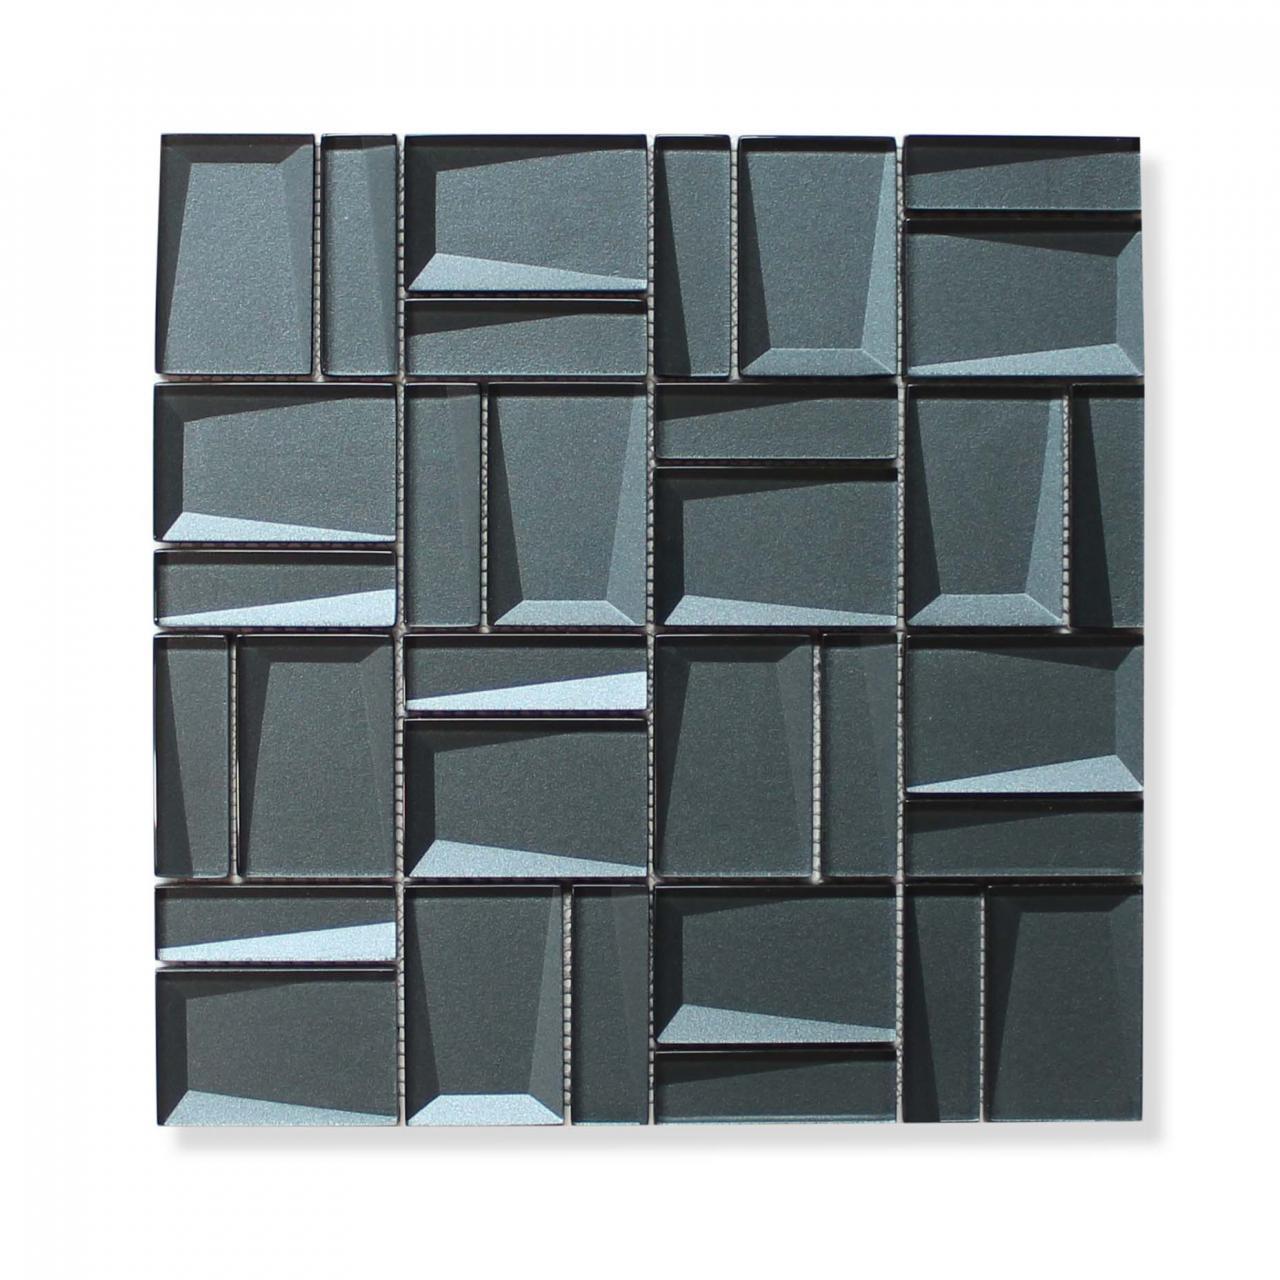 - Illusion II 3D 3x3 Beveled Glass Mosaic Tiles - Sapphire